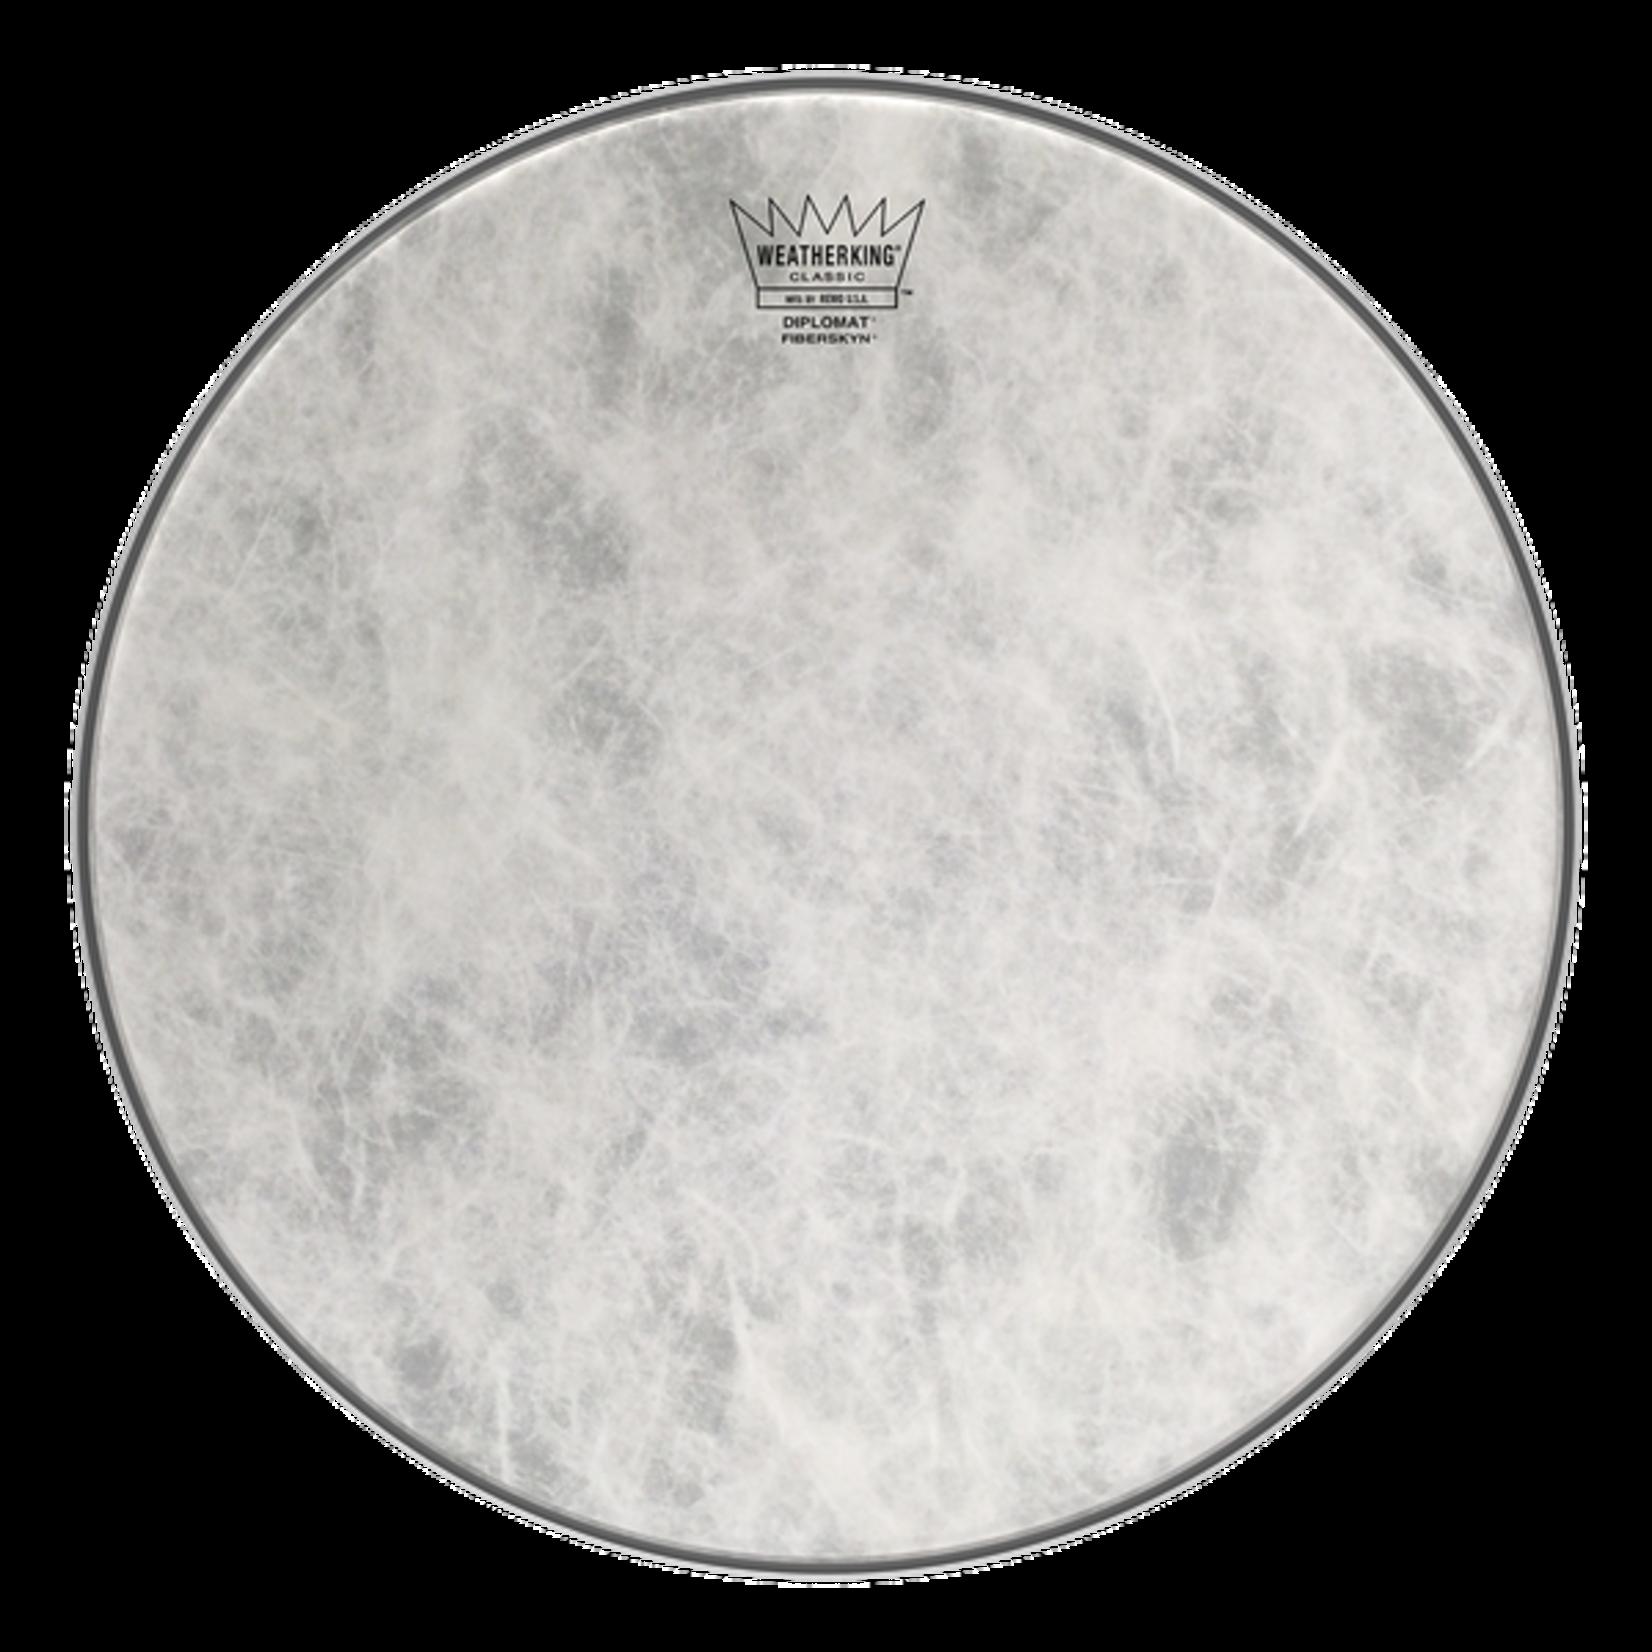 Remo Remo Classic Fit Fiberskyn Diplomat Bass Drum